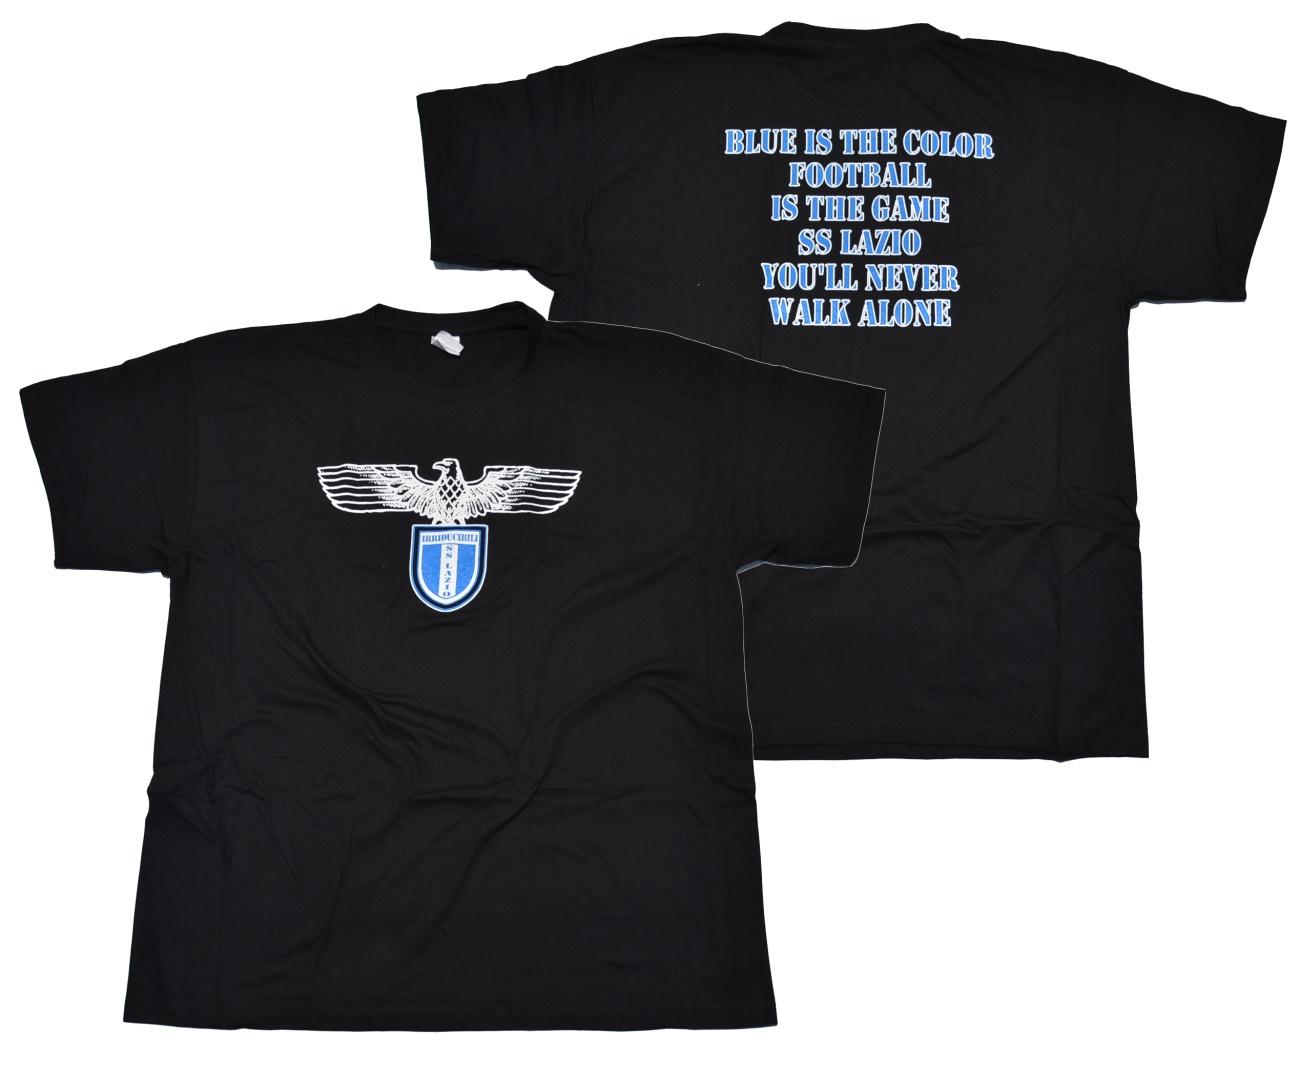 T shirt irriducibili lazio in xl 3 halbzeit details for Irriducibili shop